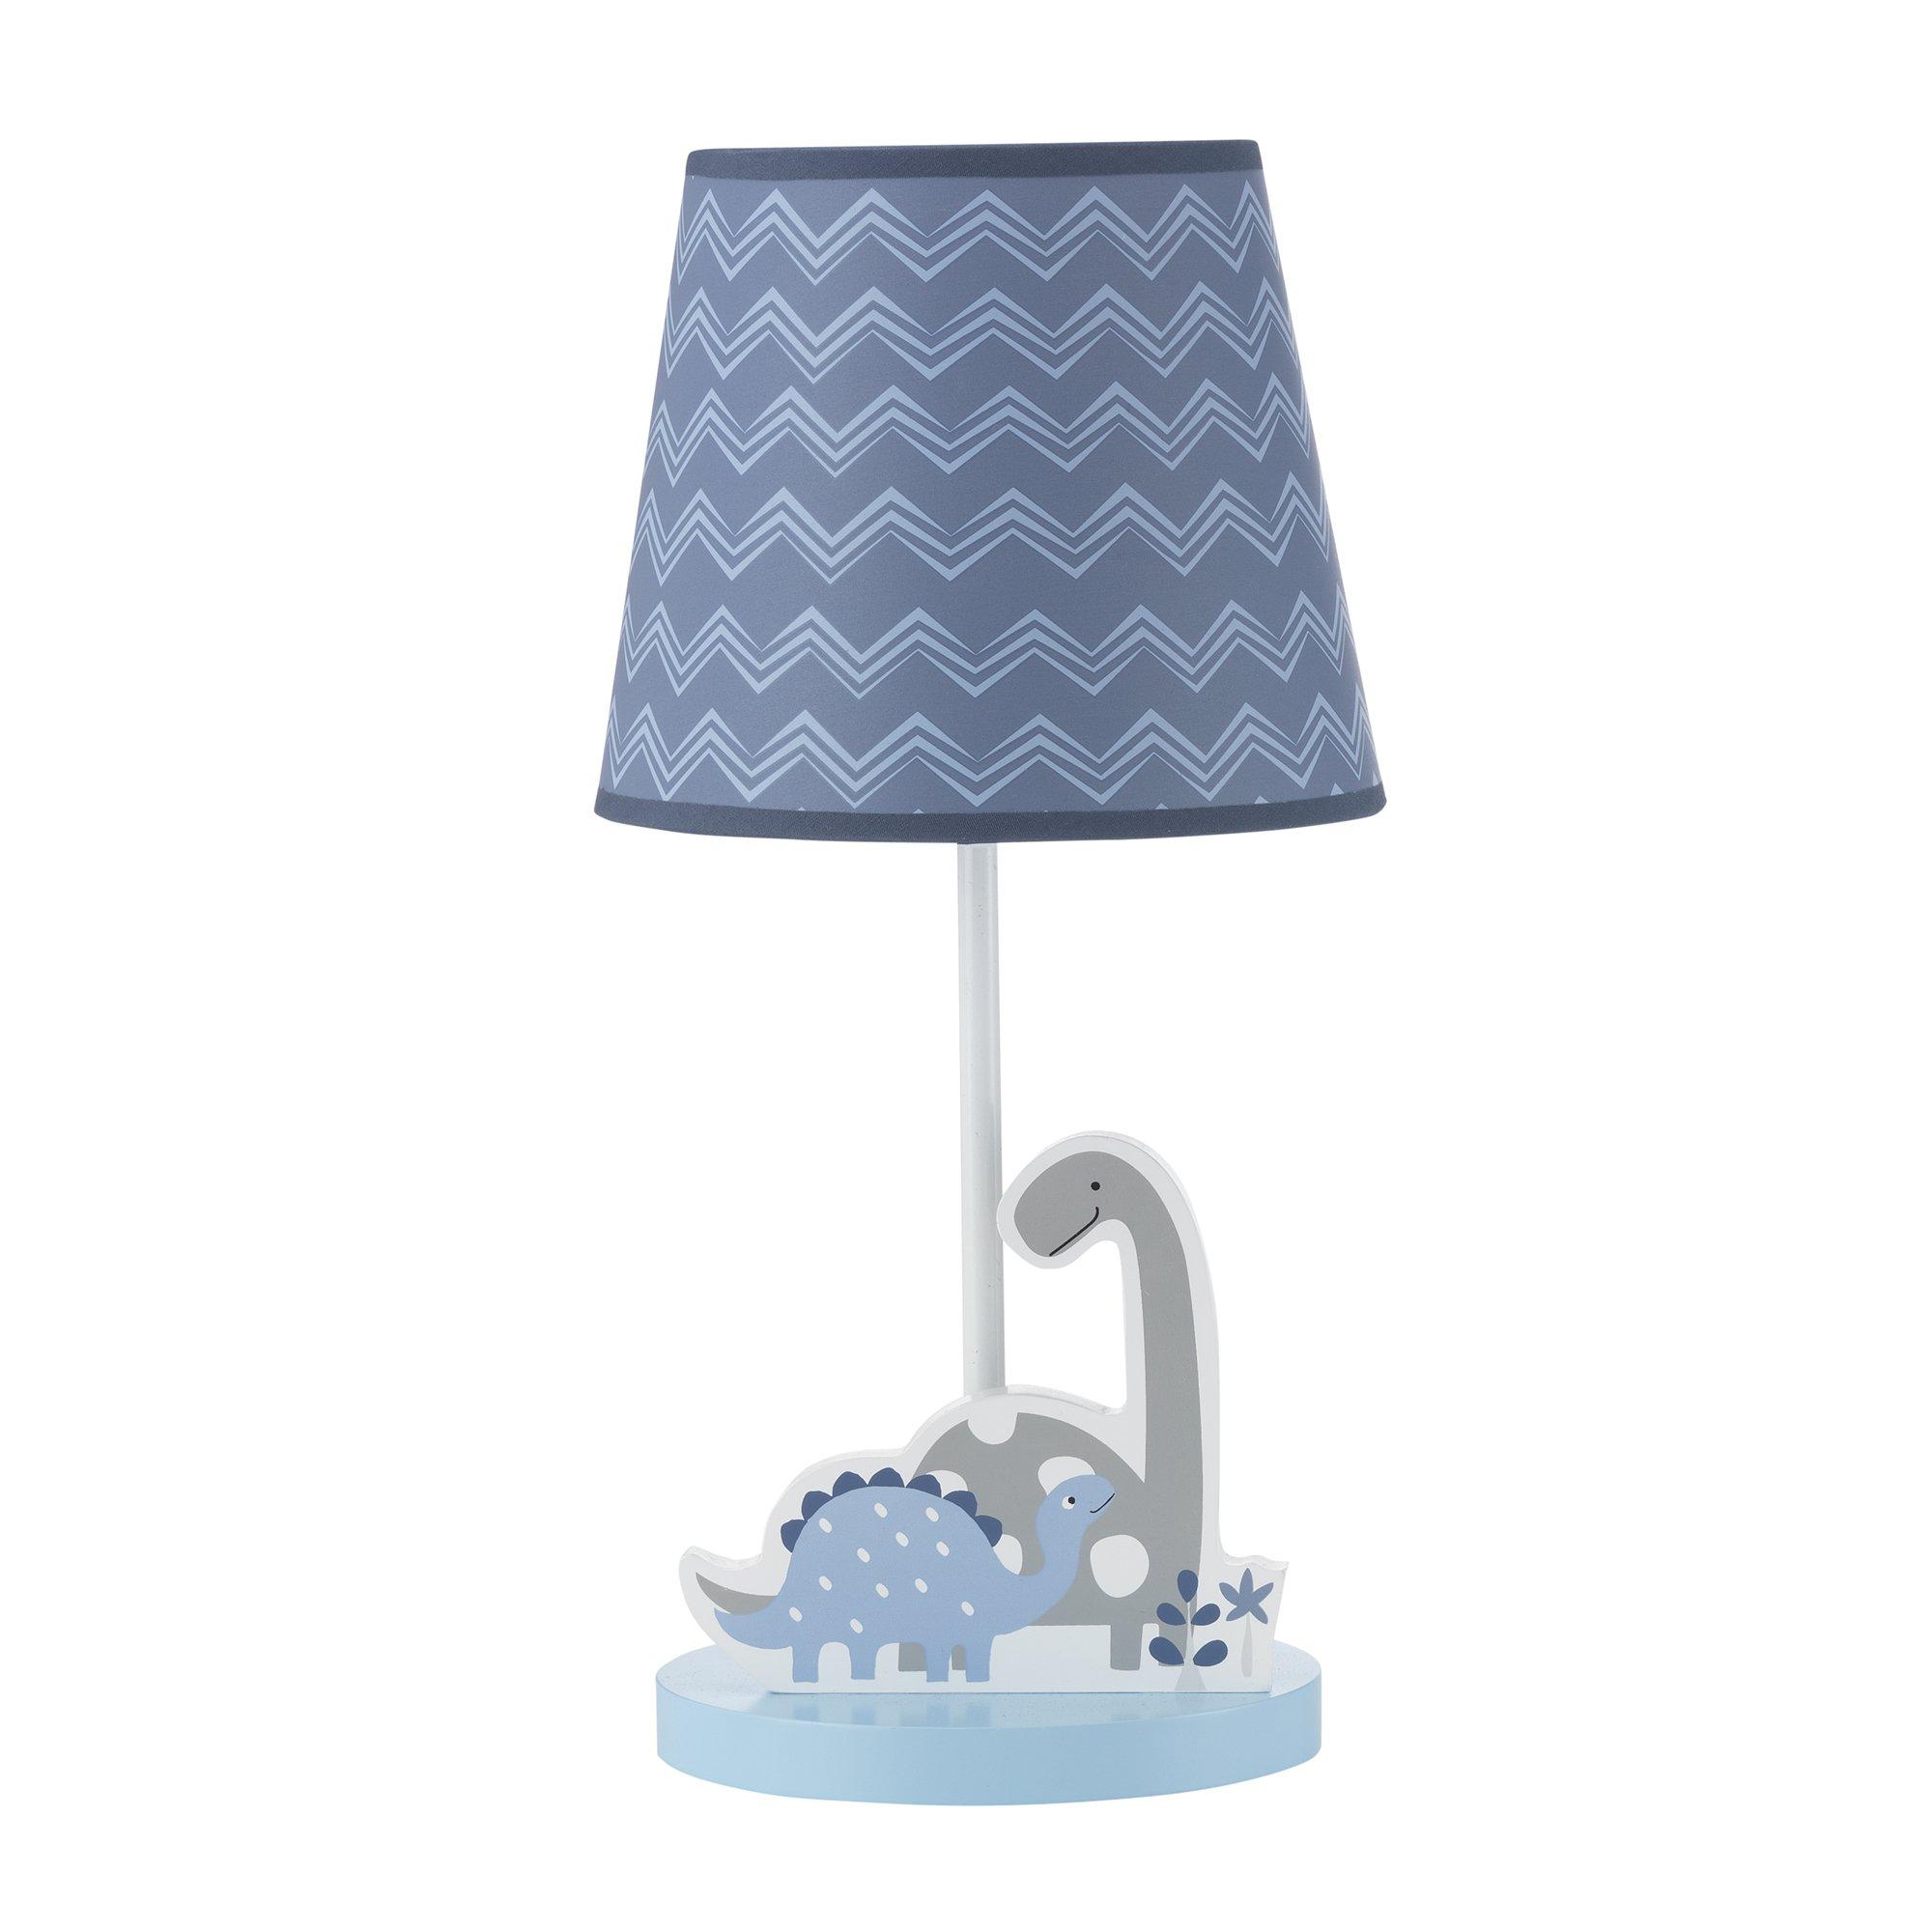 Bedtime Originals Roar Dinosaur Lamp with Shade & Bulb, Blue/Gray by Bedtime Originals